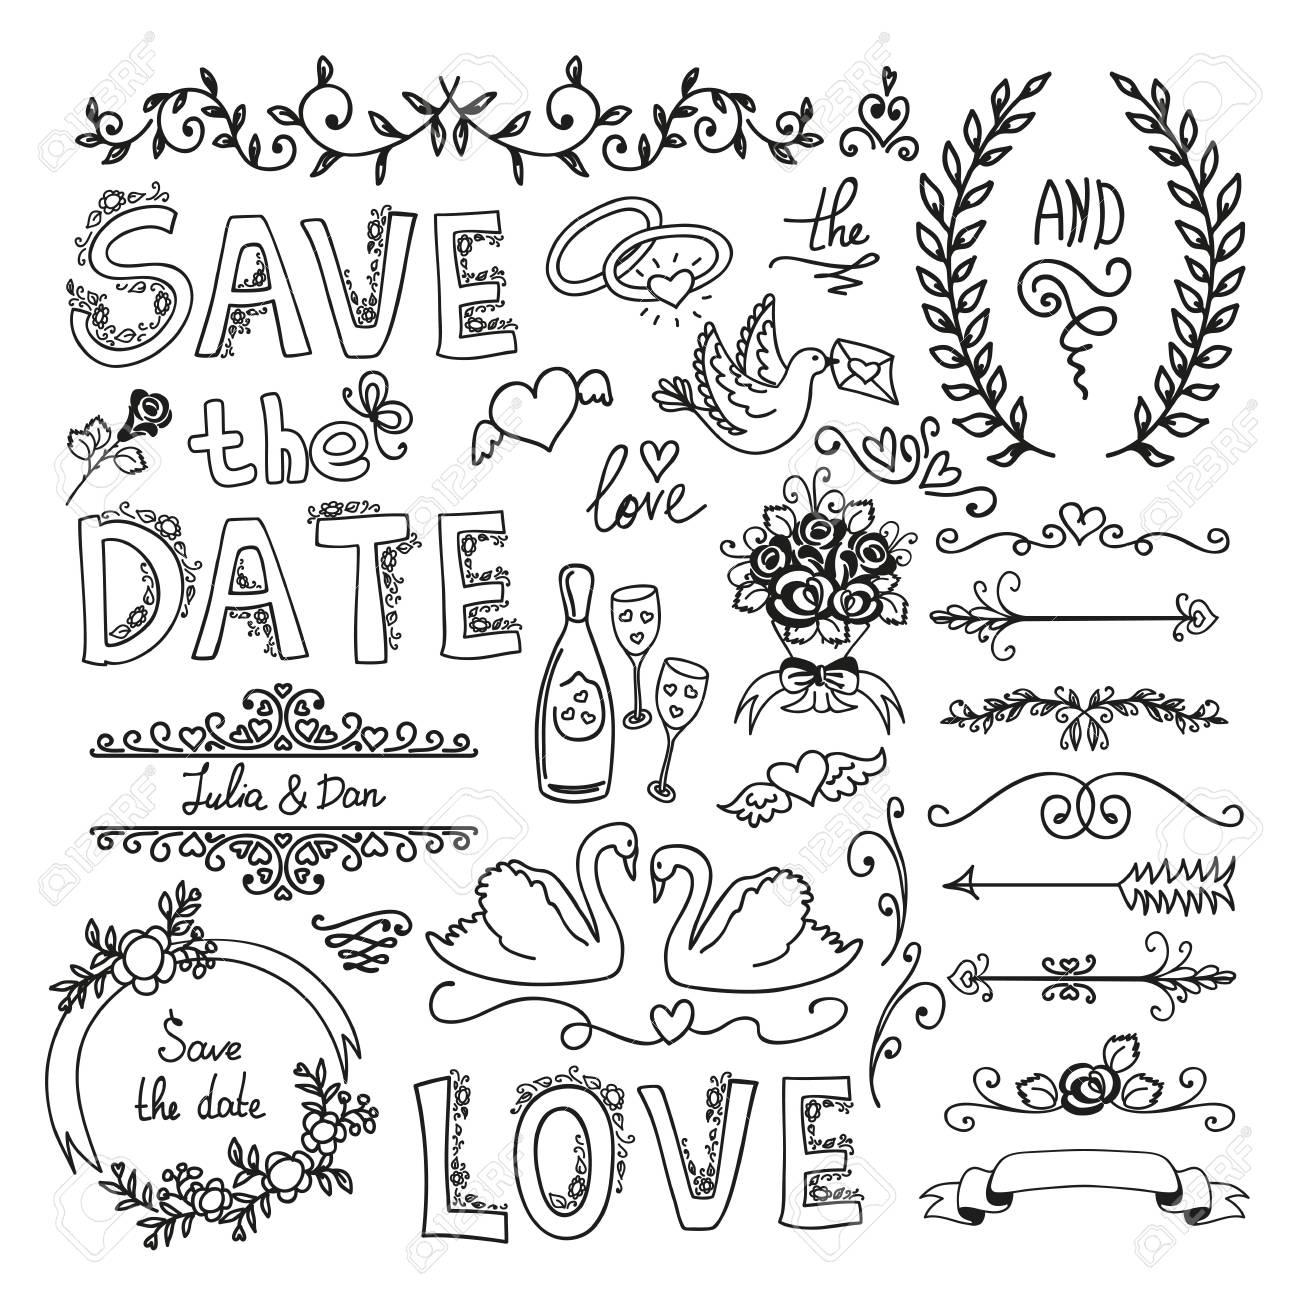 Set of wedding ornaments and decorative elements royalty free set of wedding ornaments and decorative elements stock vector 41664694 junglespirit Choice Image